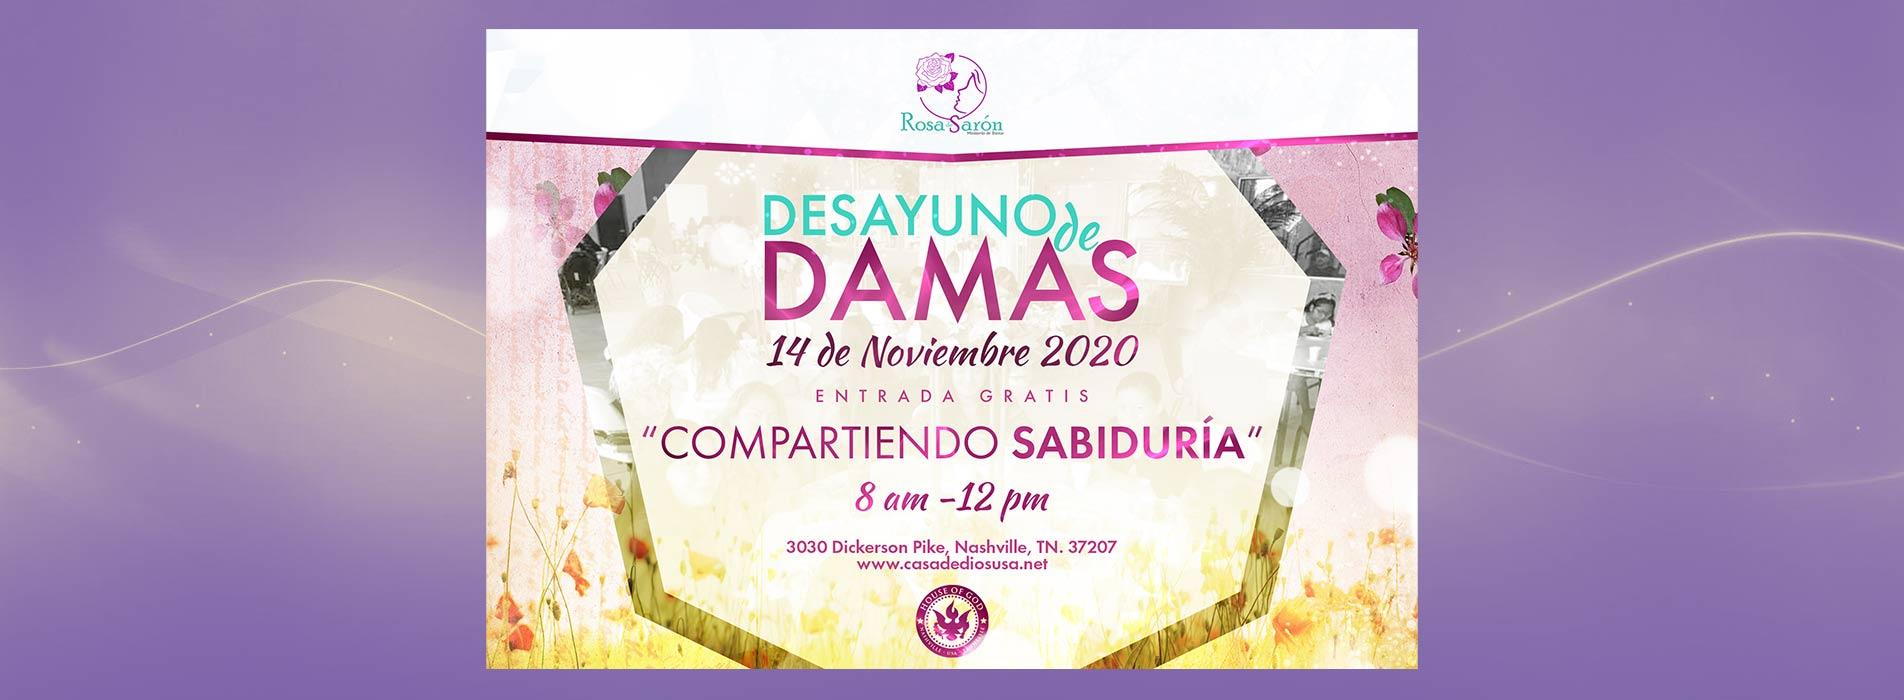 Slider-Desayuno-de-Damas-Nov2020